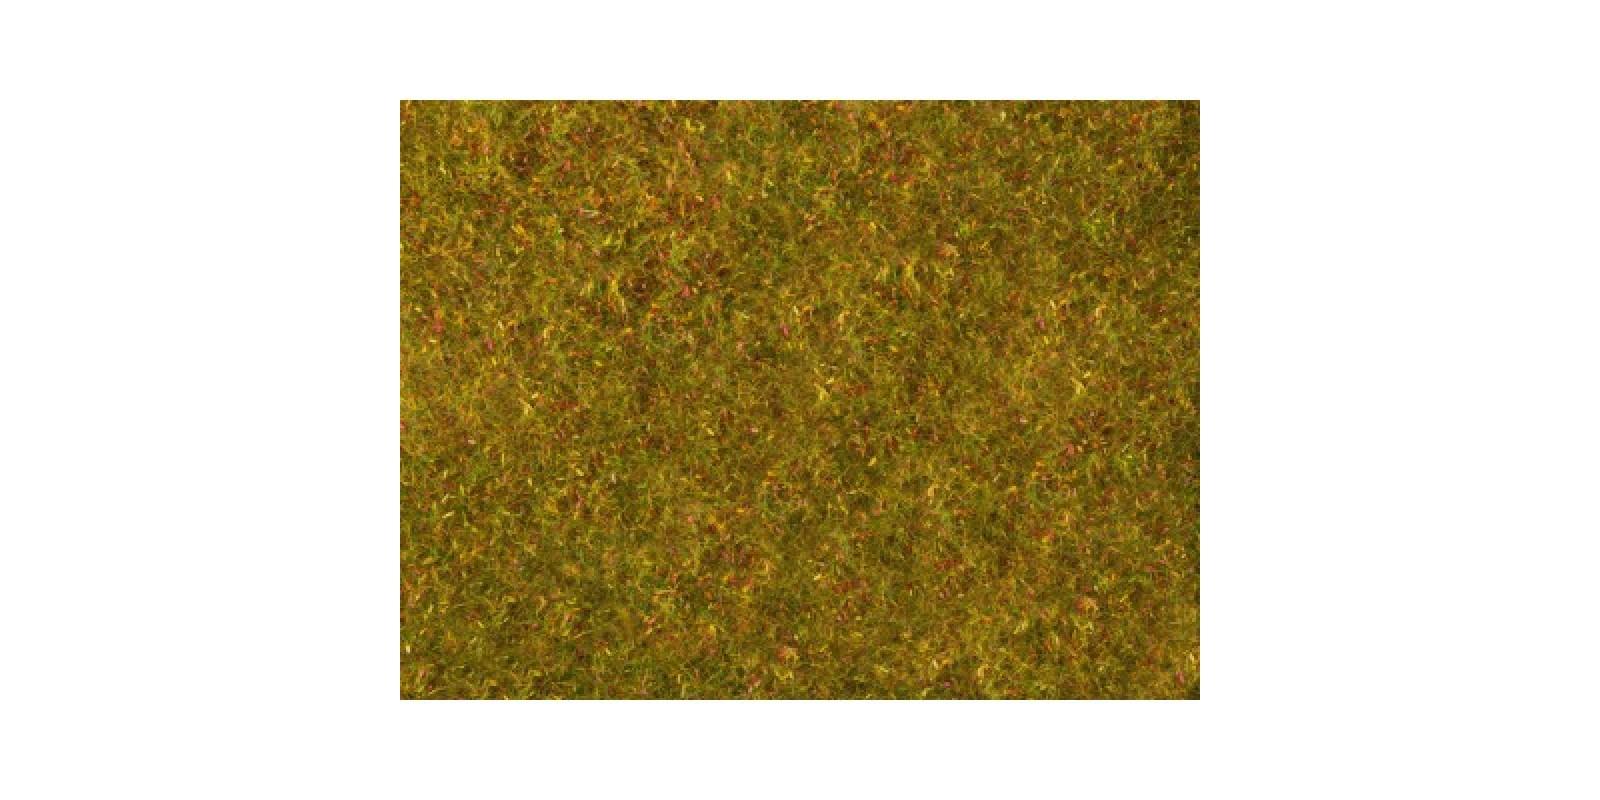 NO07290 Meadow Foliage, yellow-green